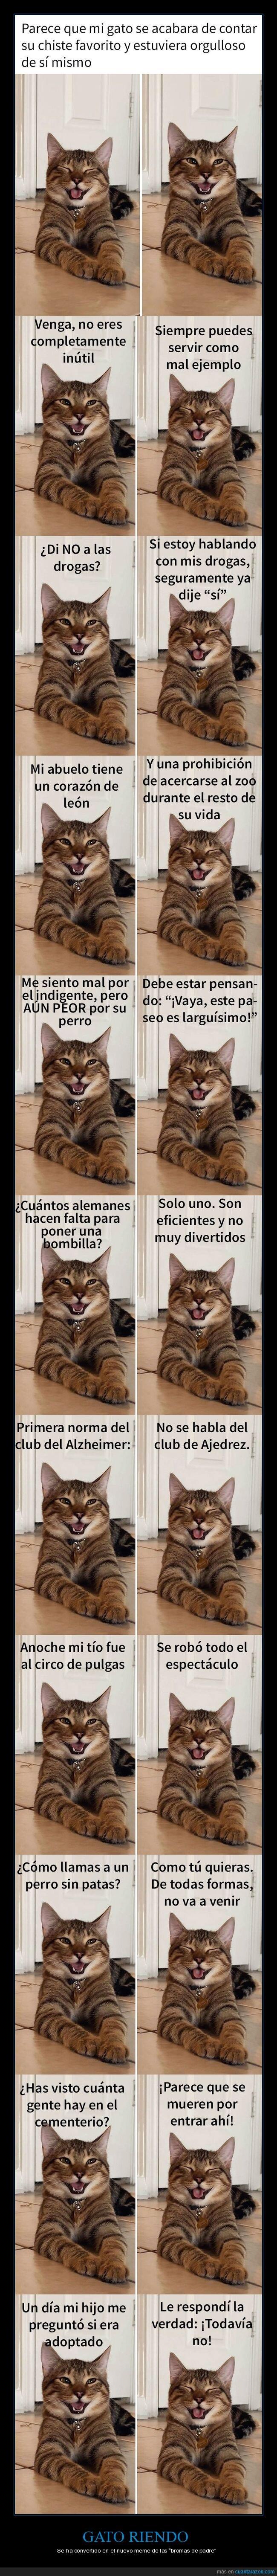 bromas de padre,gato,meme,riendo